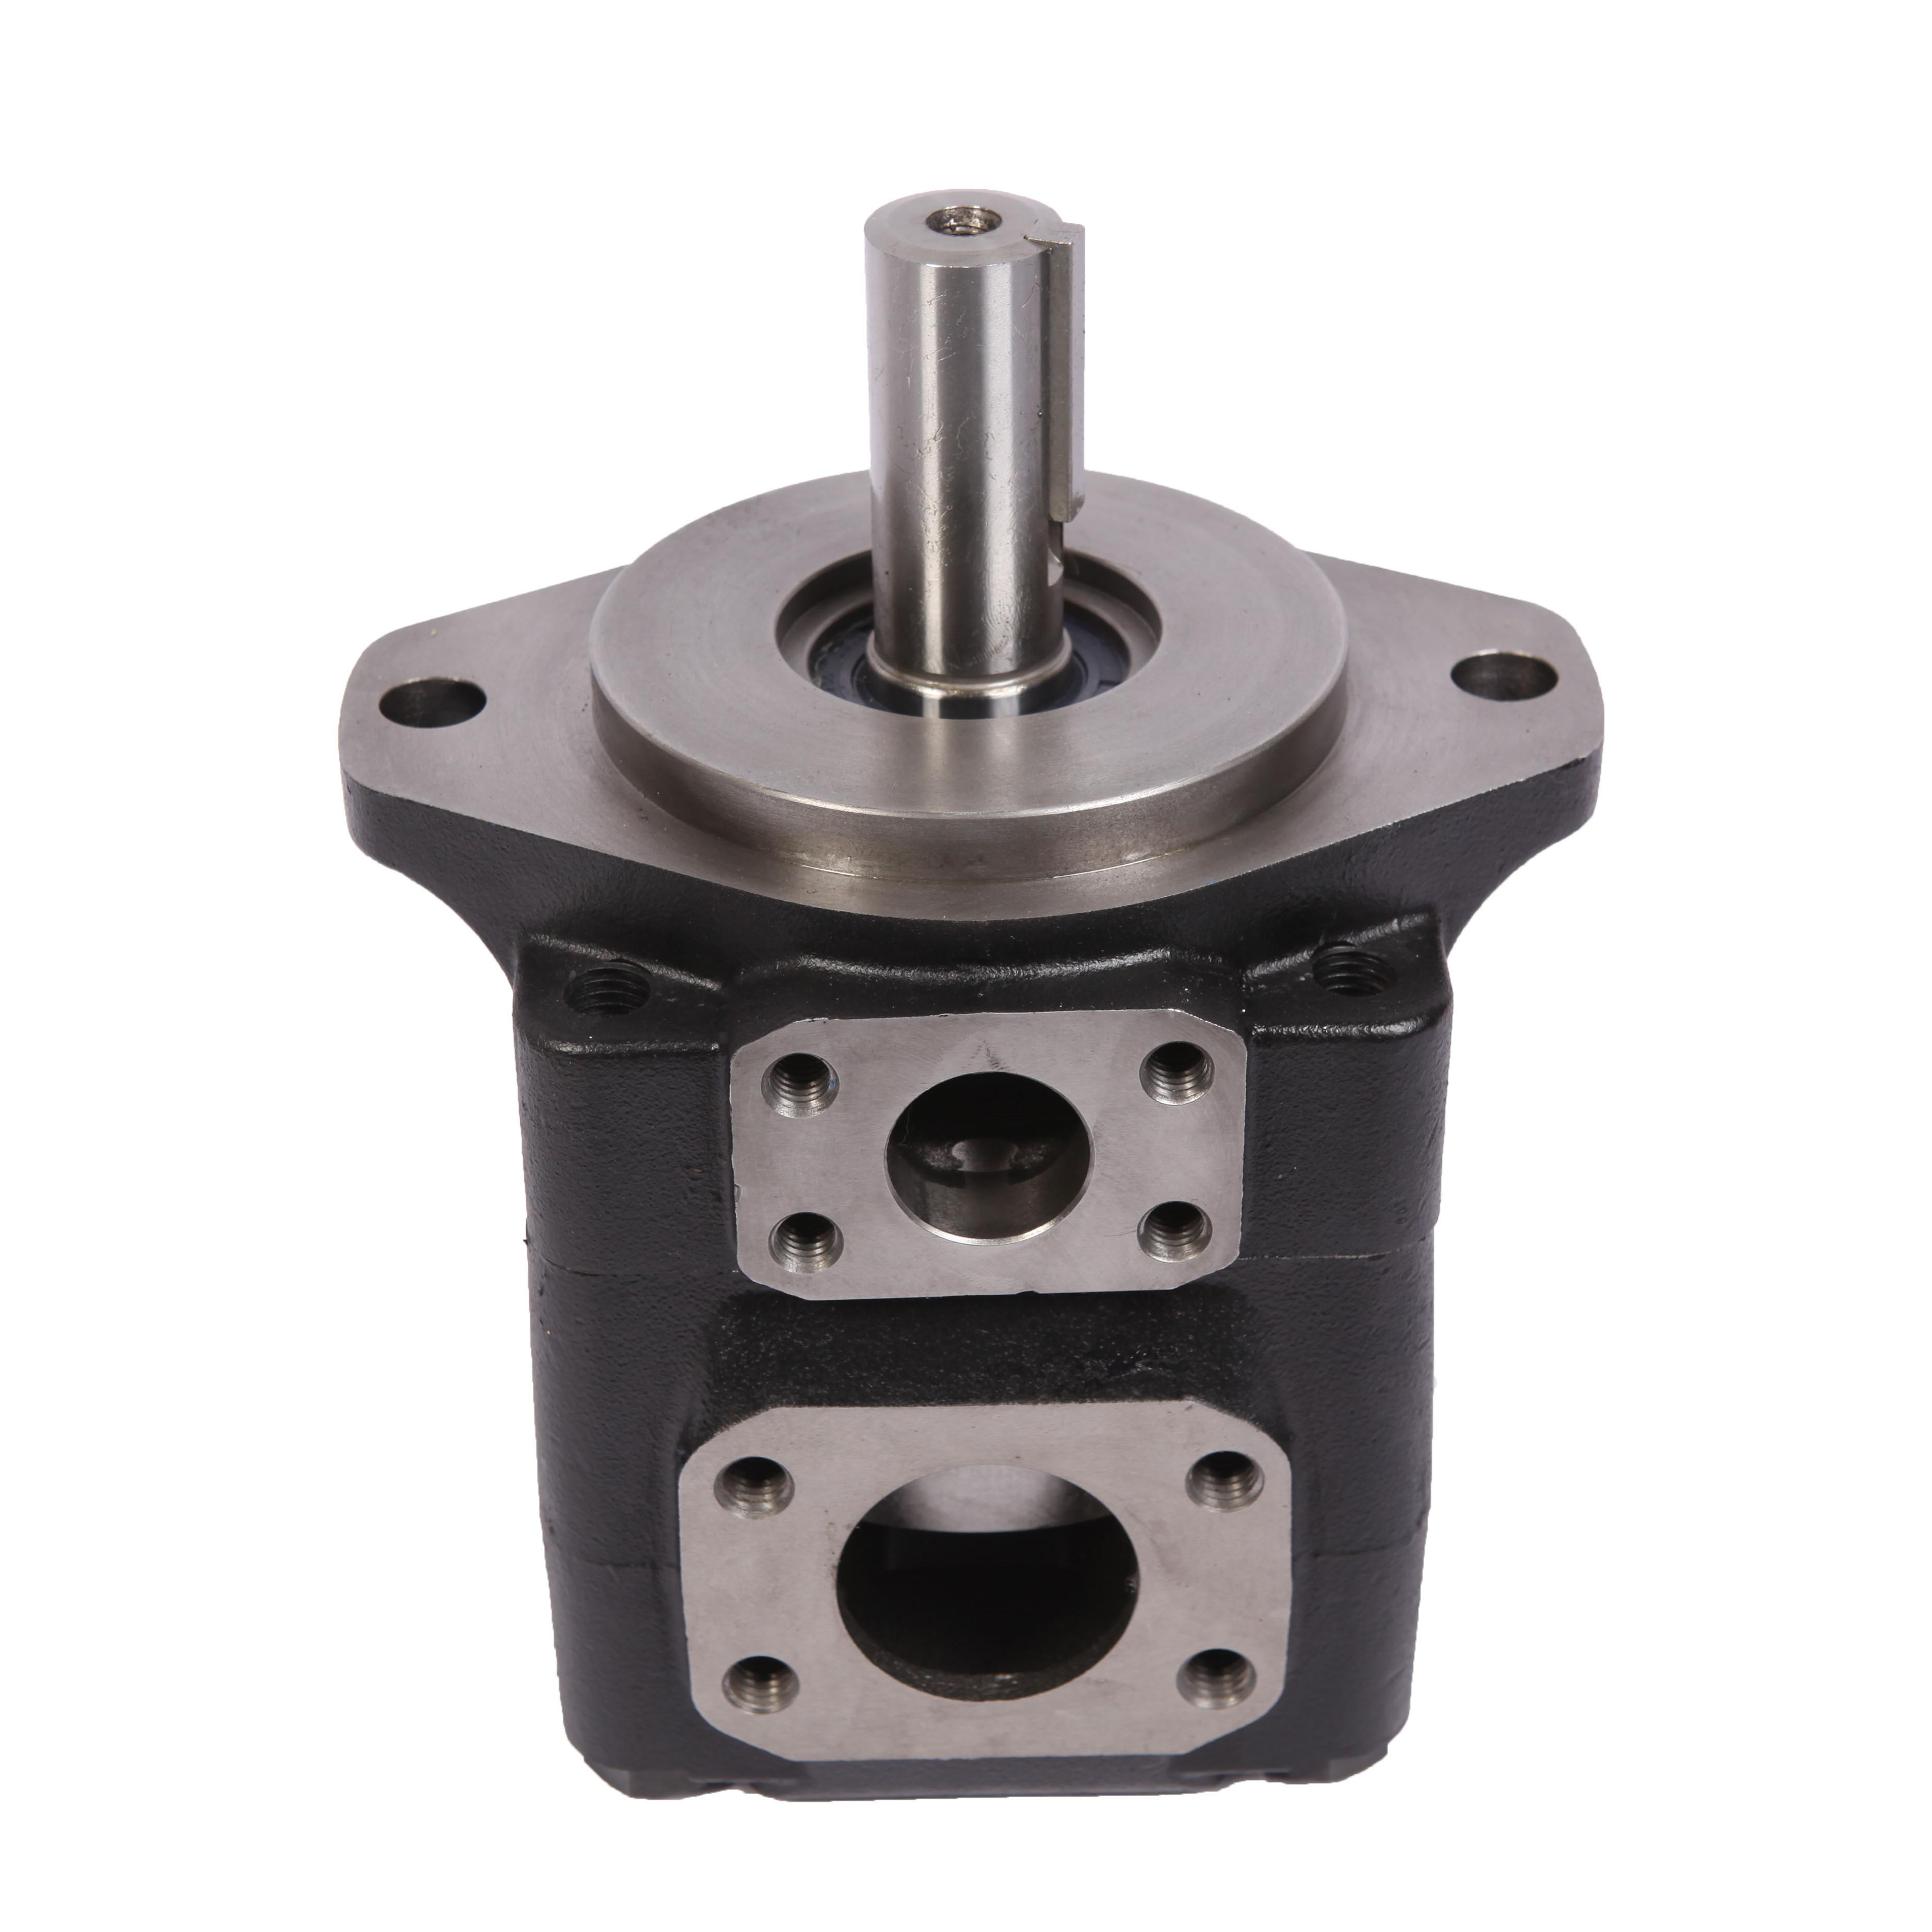 T6 single denison pump hydraulics